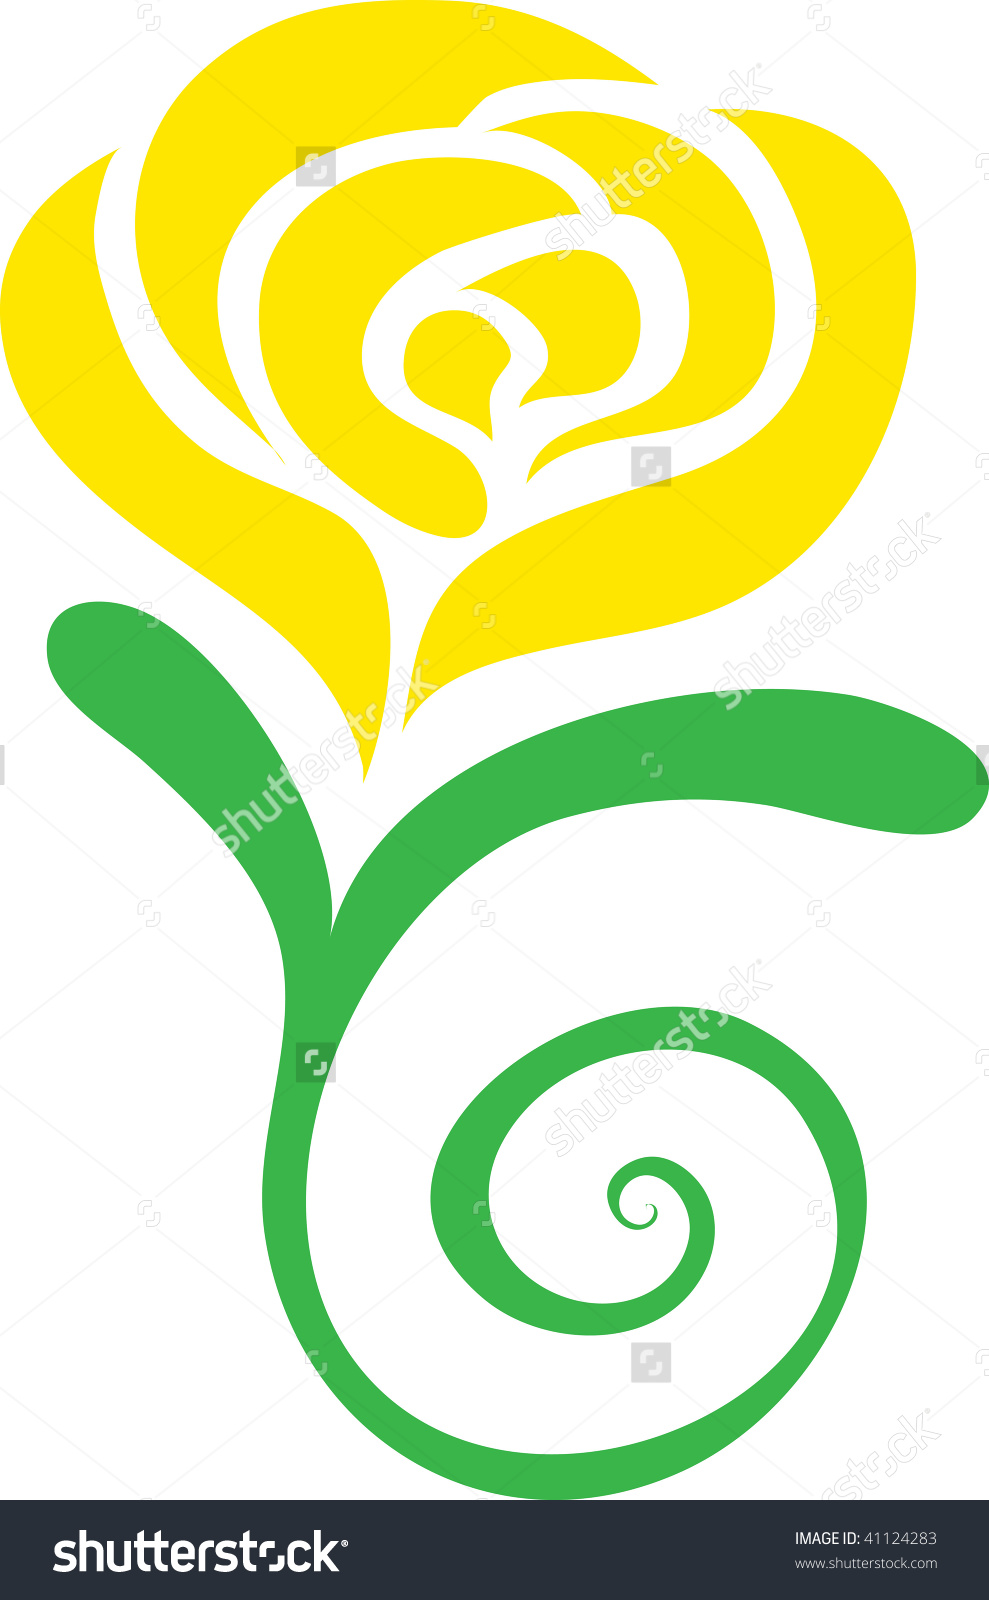 Clip Art Illustration Of A Yellow Rose. -Clip art illustration of a yellow rose. Preview. Save to a lightbox-2